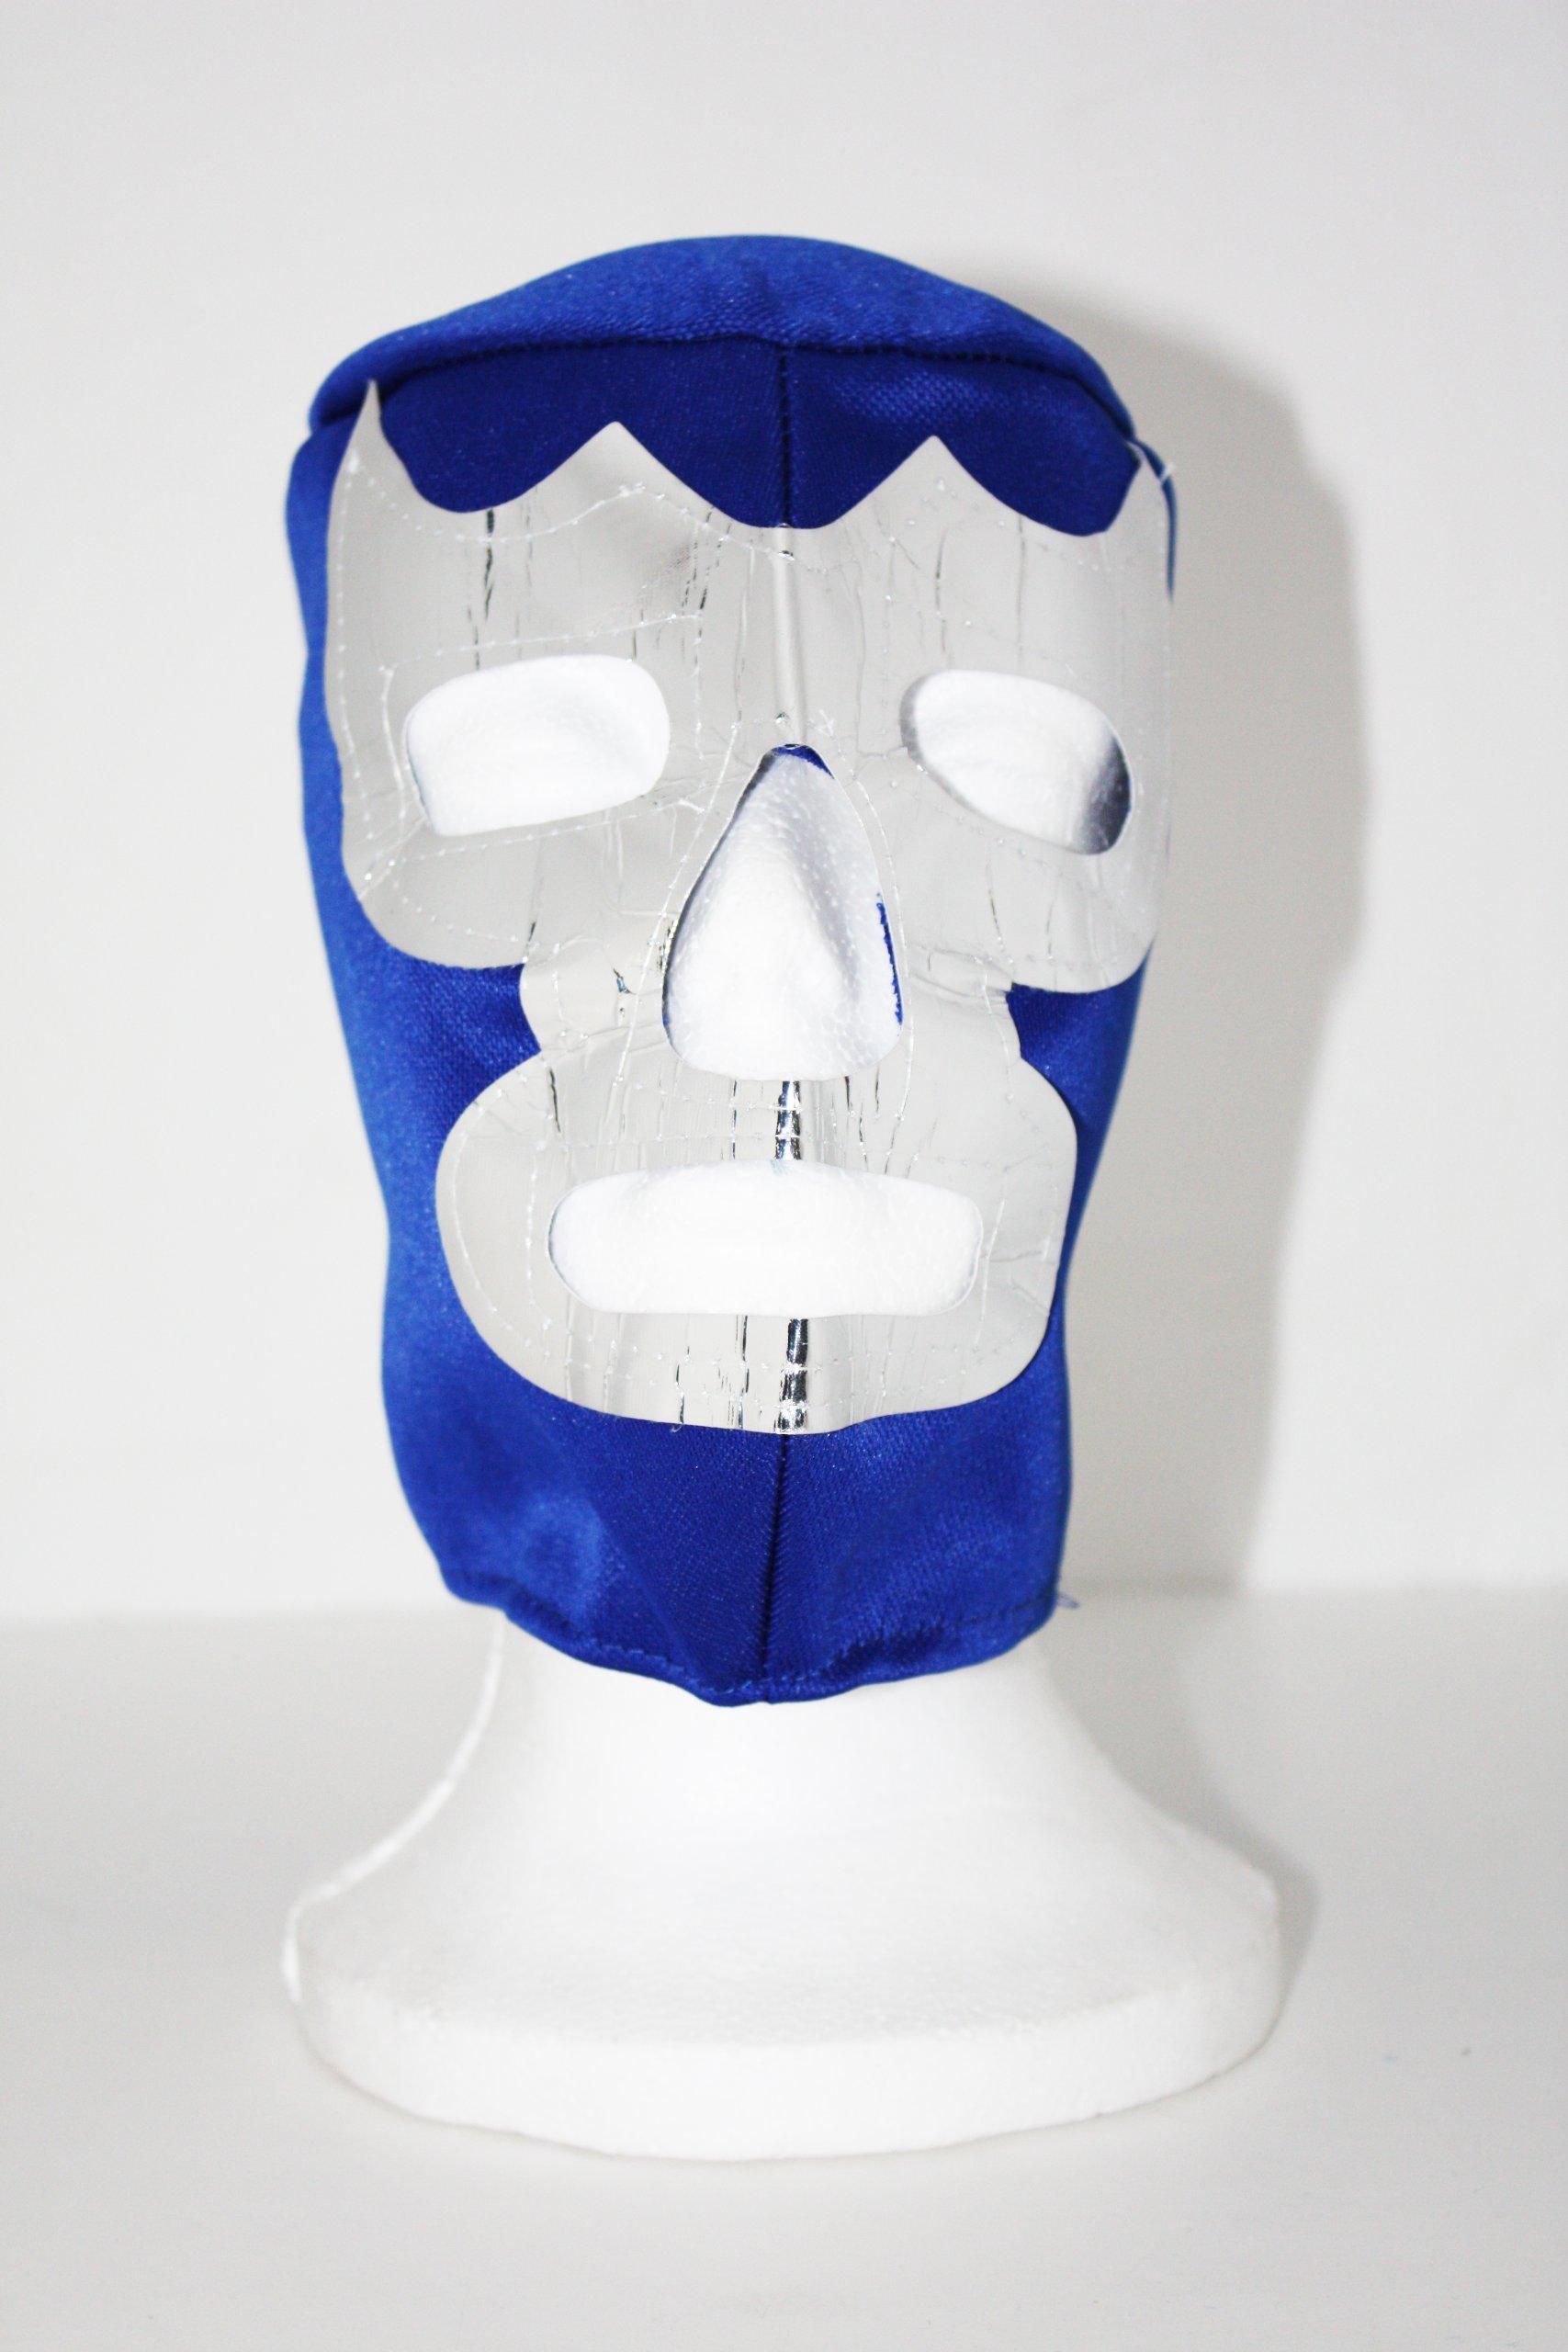 Blue Demon Lucha Libre Kids Wrestling Mask by Blue Demon